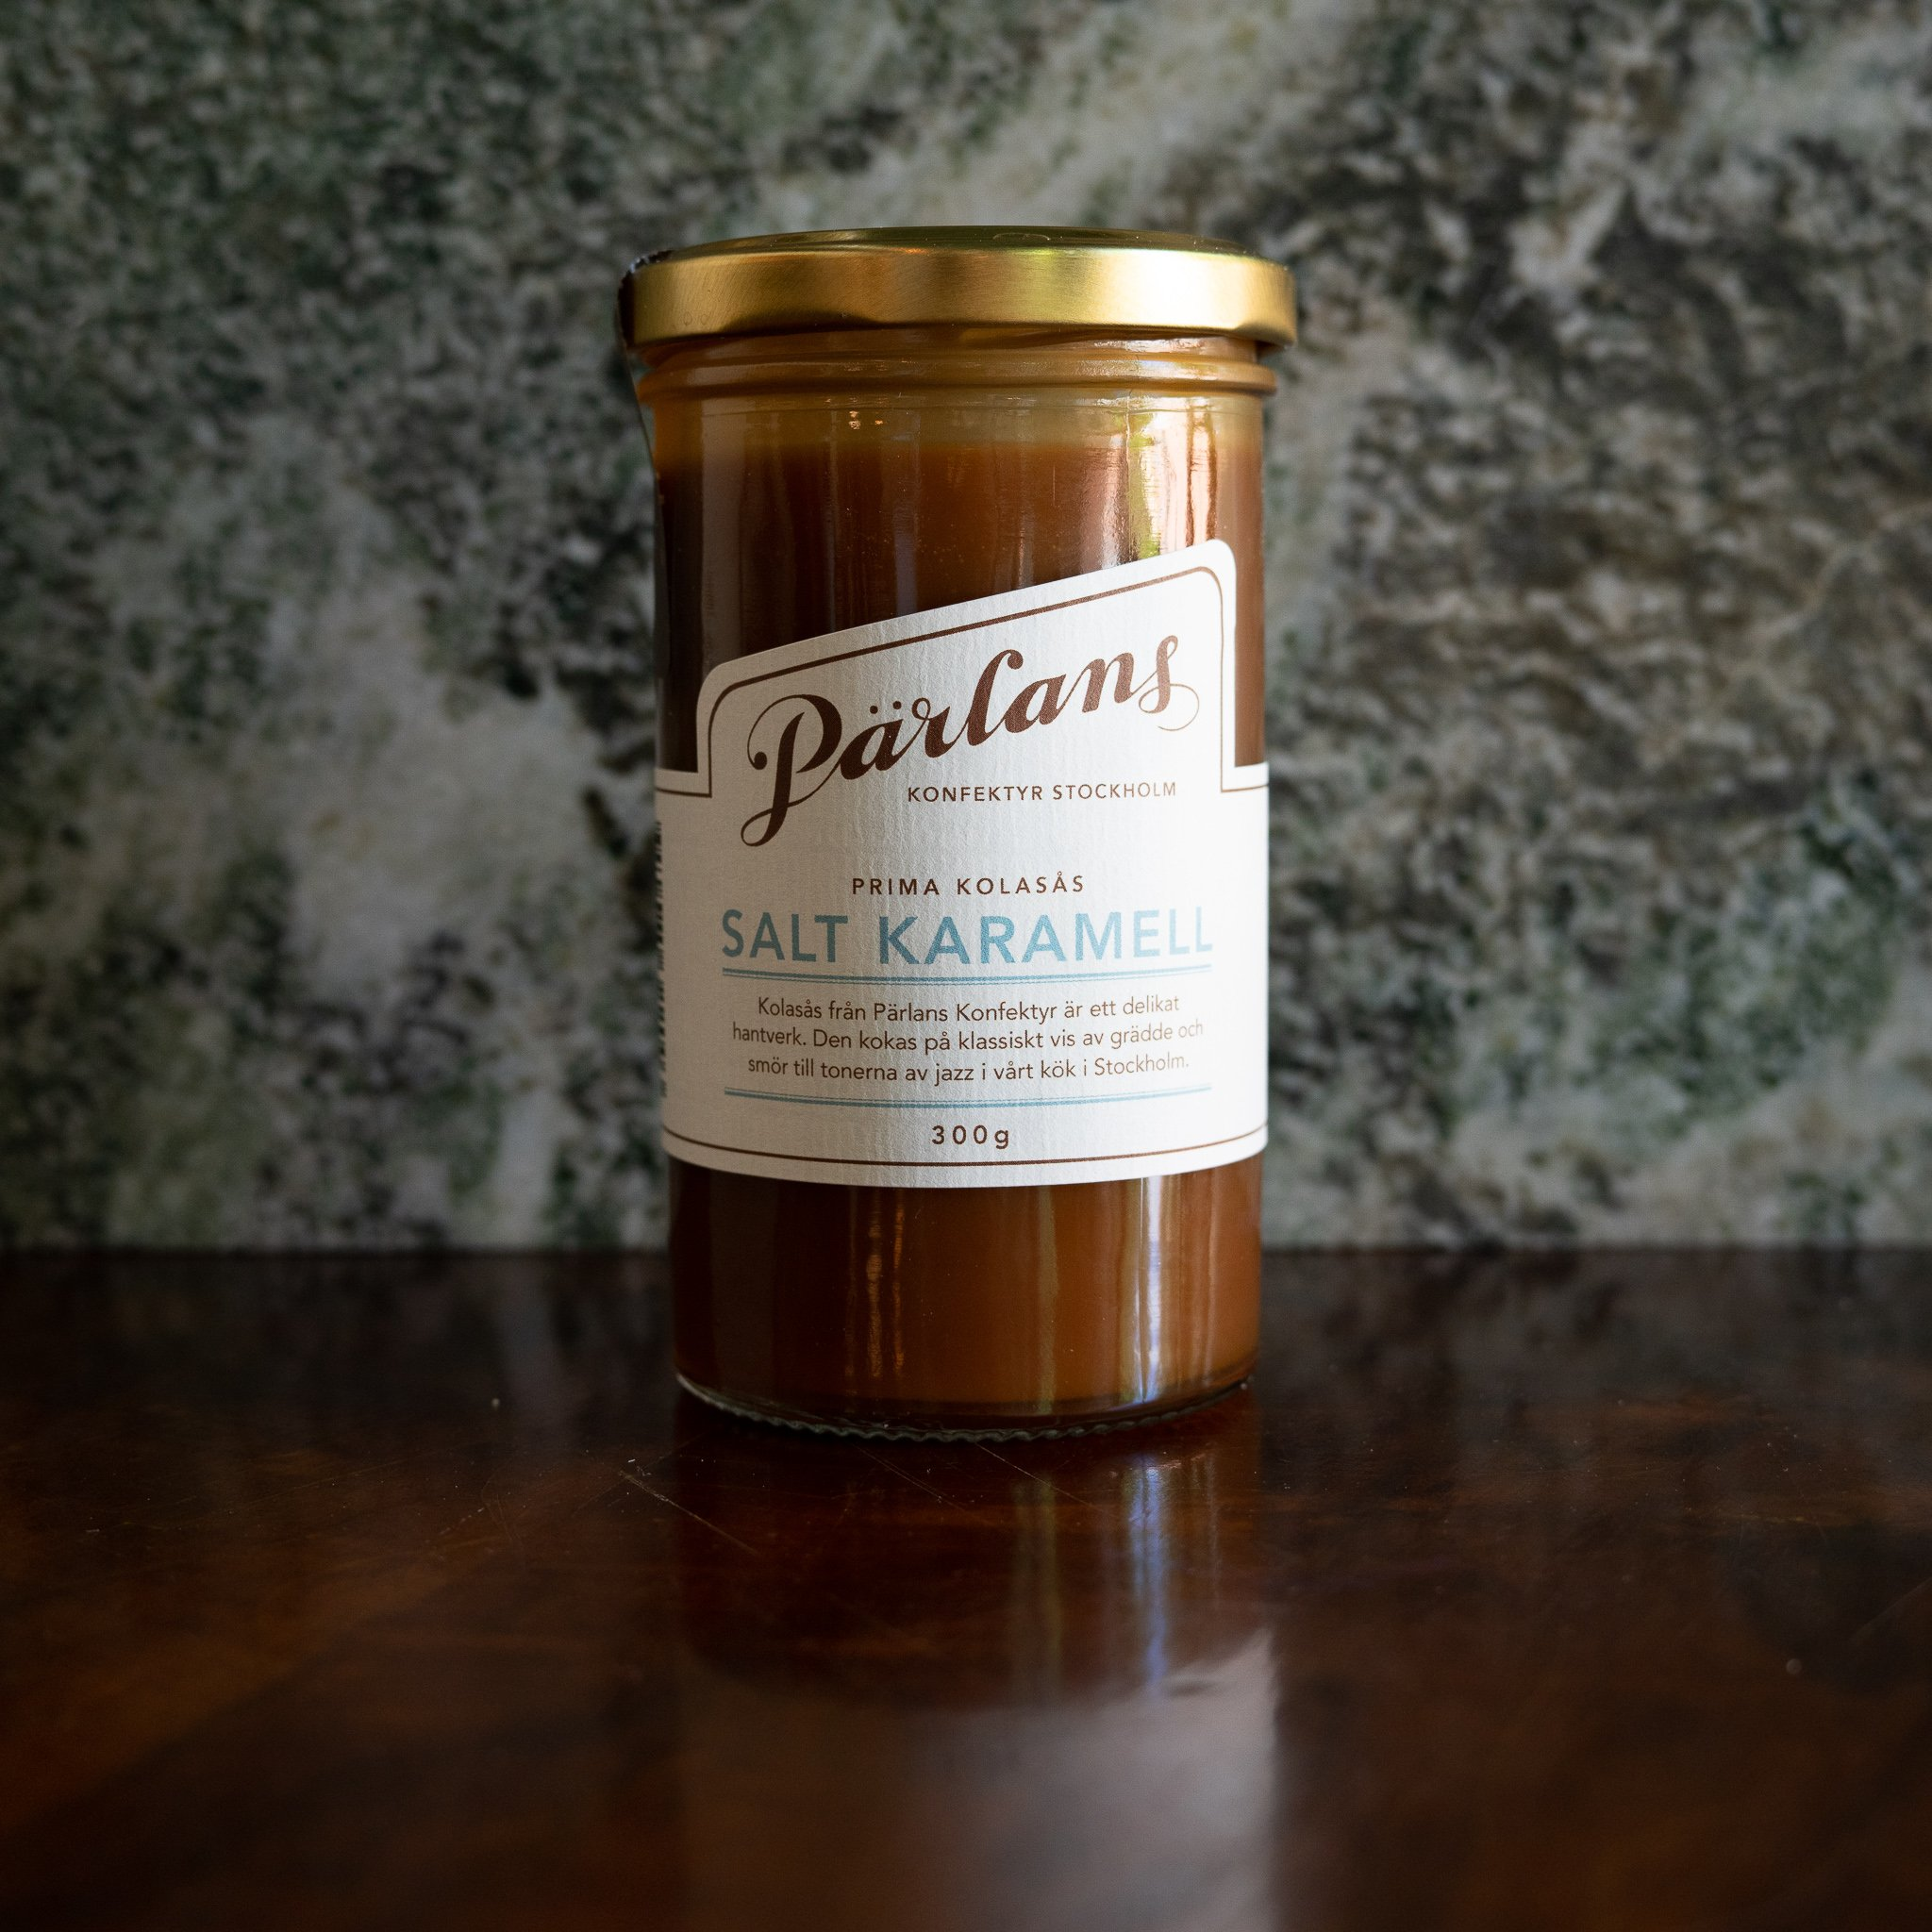 Pärlans Karamellsaus med salt karamell